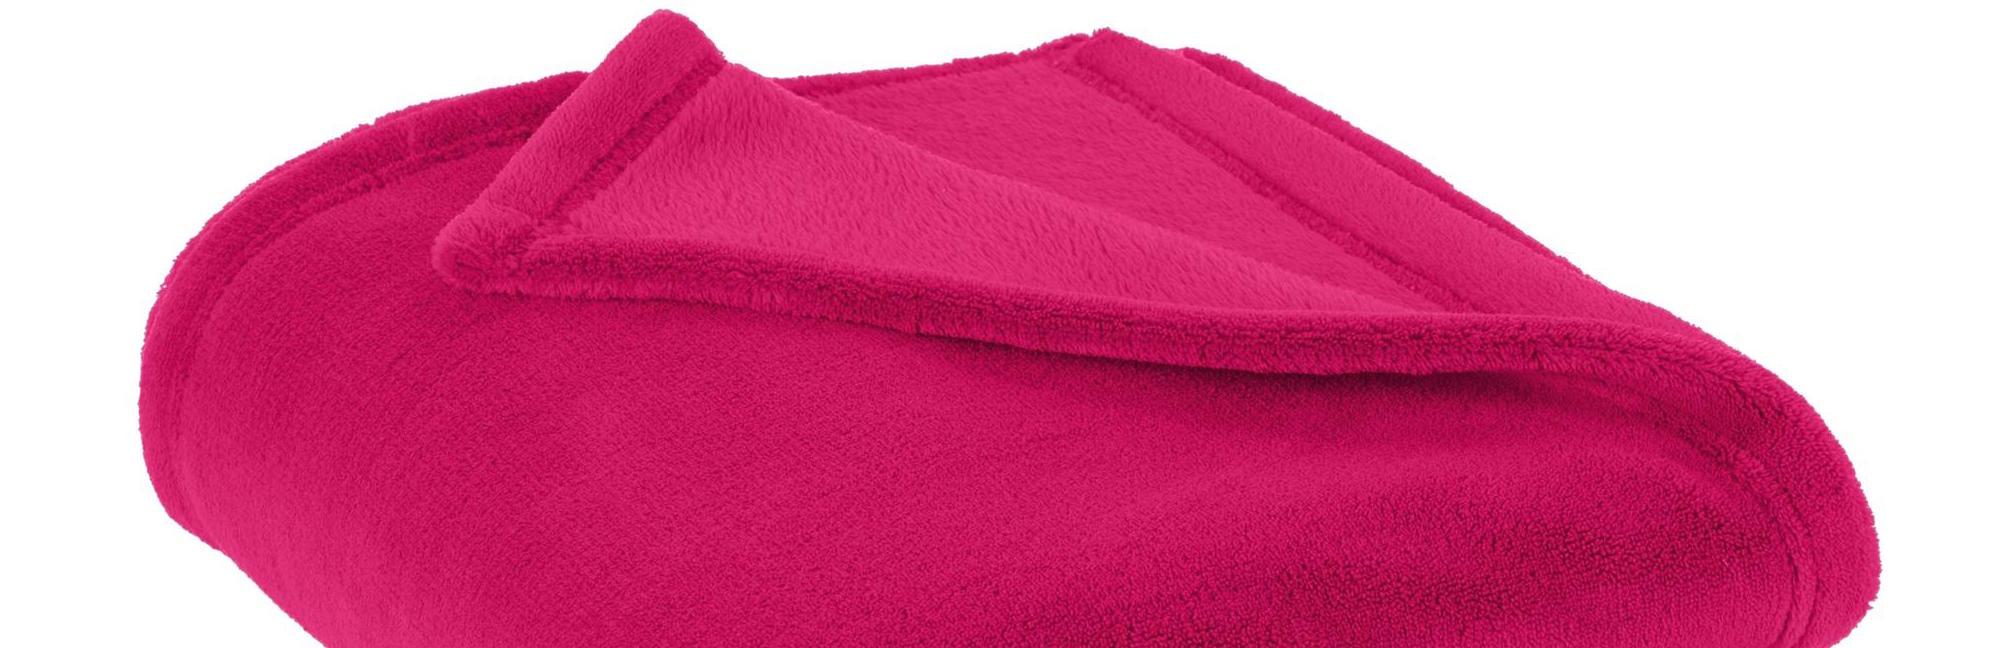 Fleece clipart bp30 charitypink folded 071312